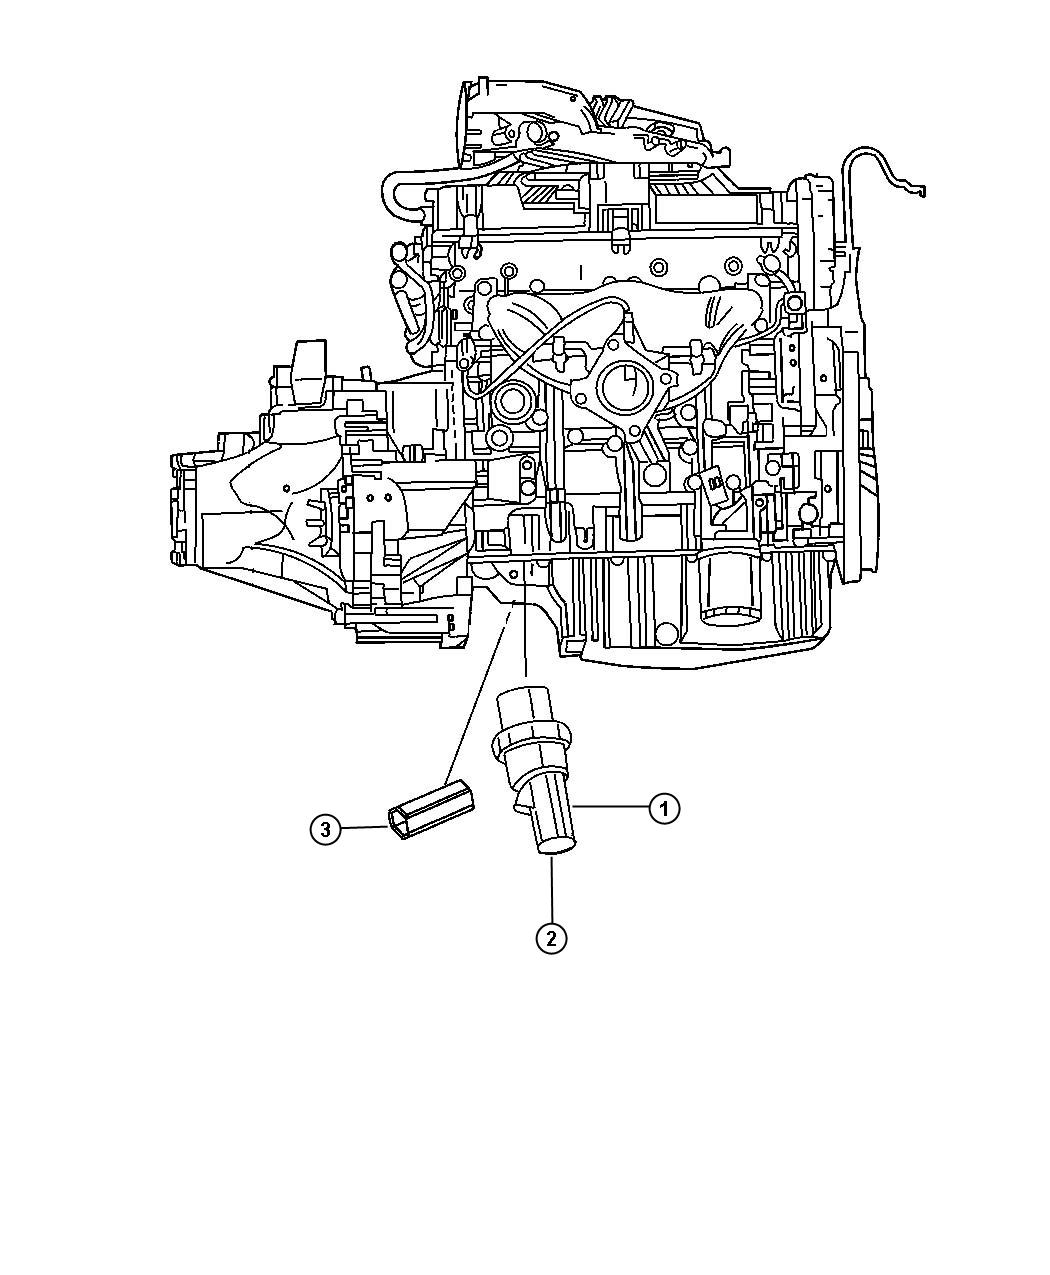 Chrysler 200 3 6l V6 24v Vvt 6 Speed Automatic 62te